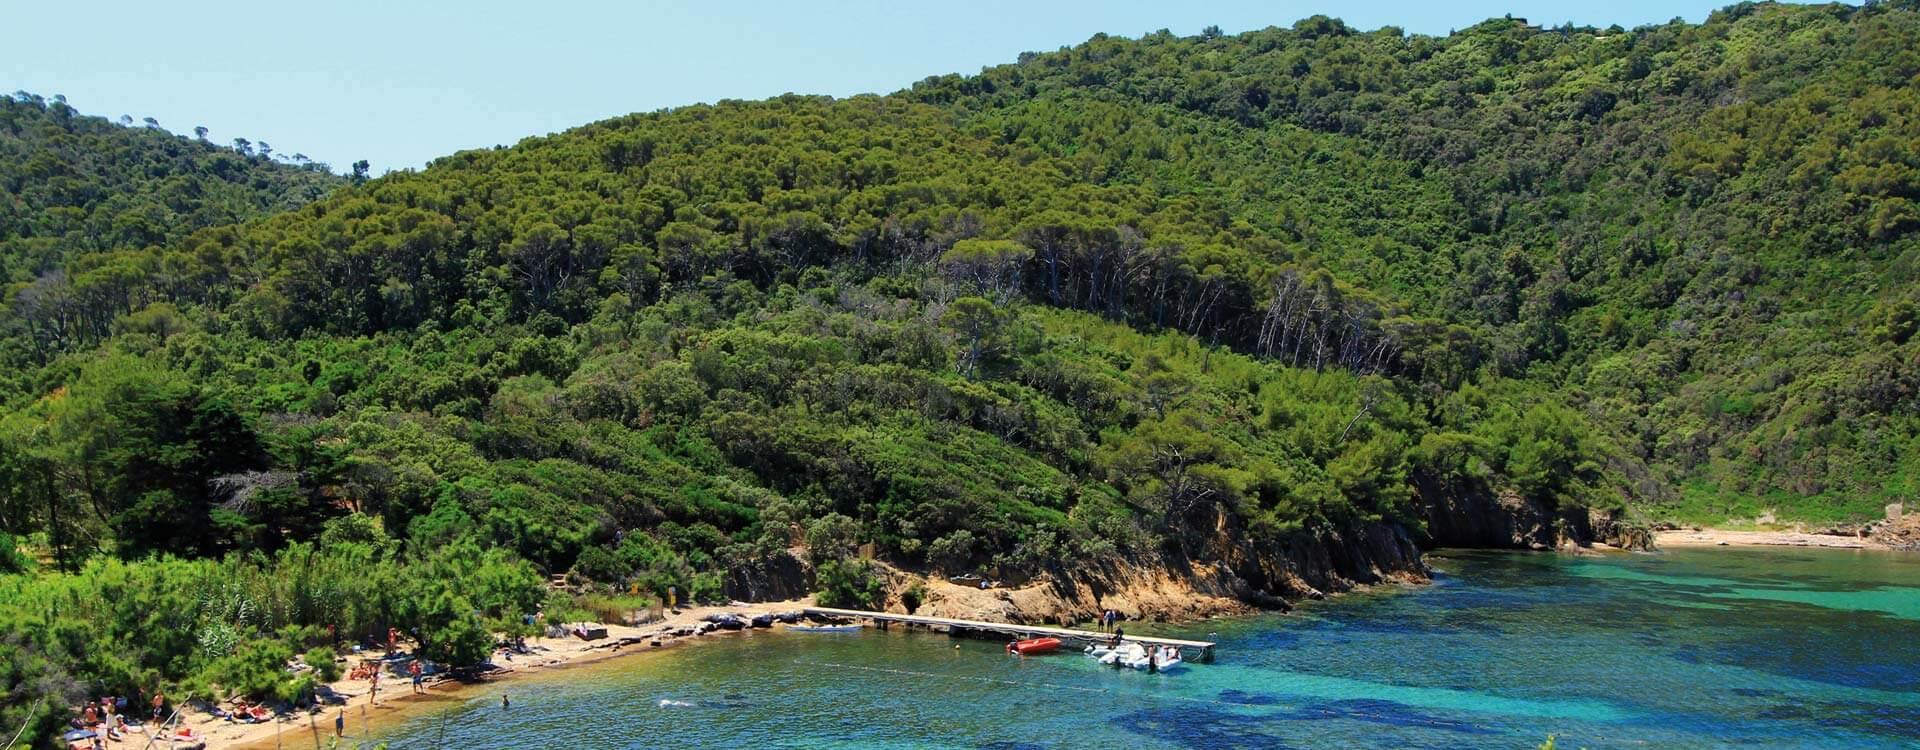 plage paradisiaque port cros